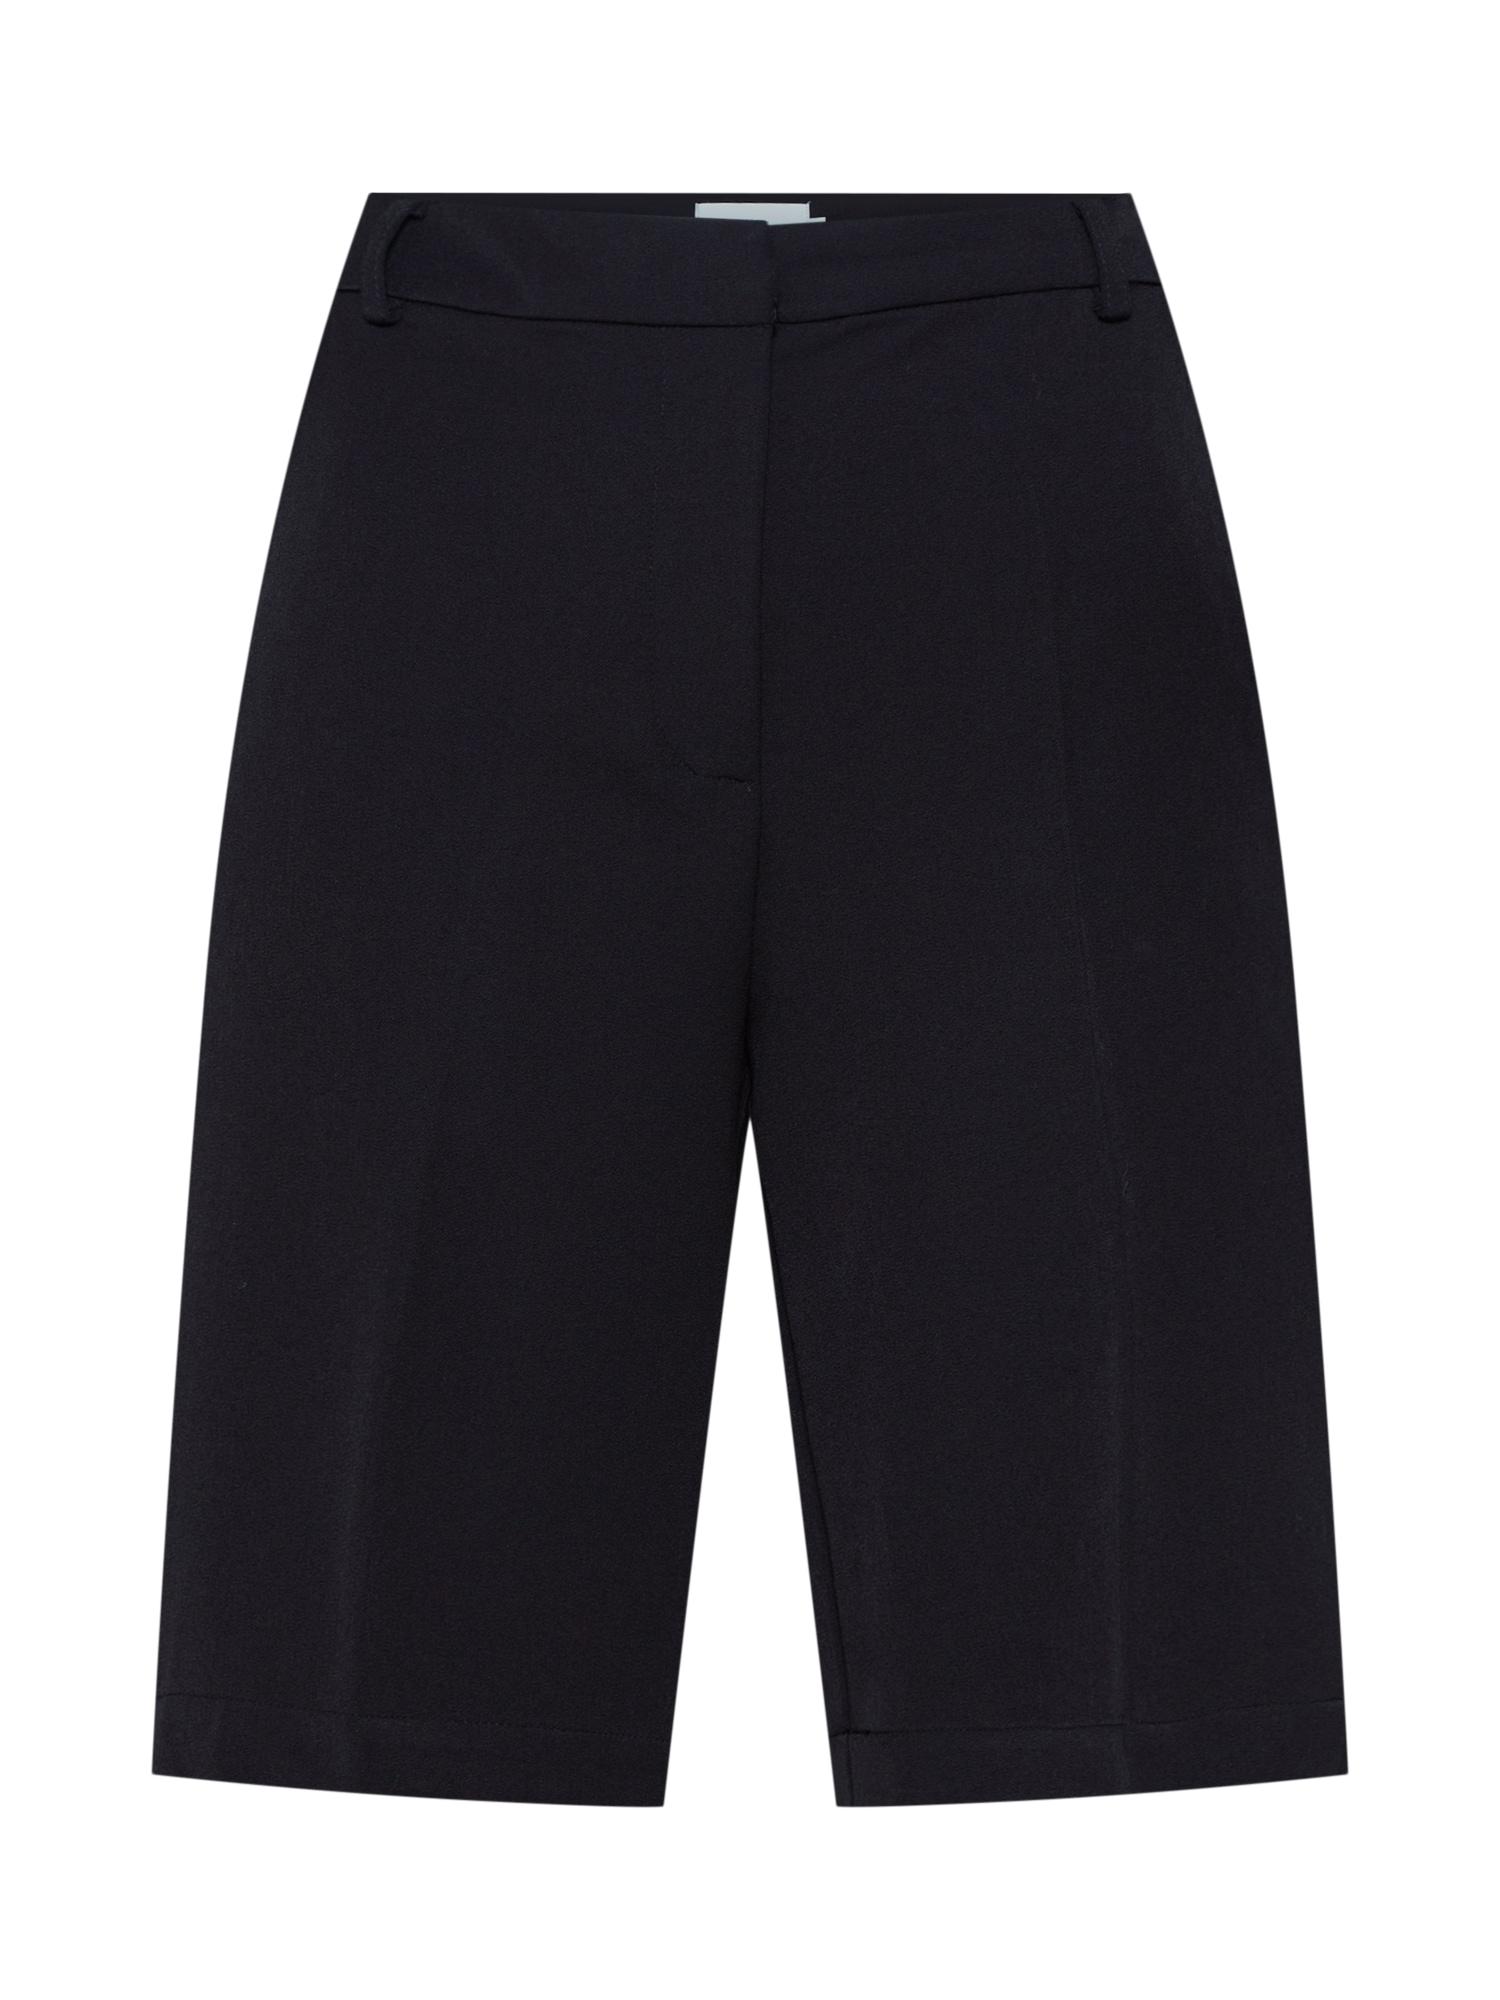 Kalhoty Mizuno černá Minimum